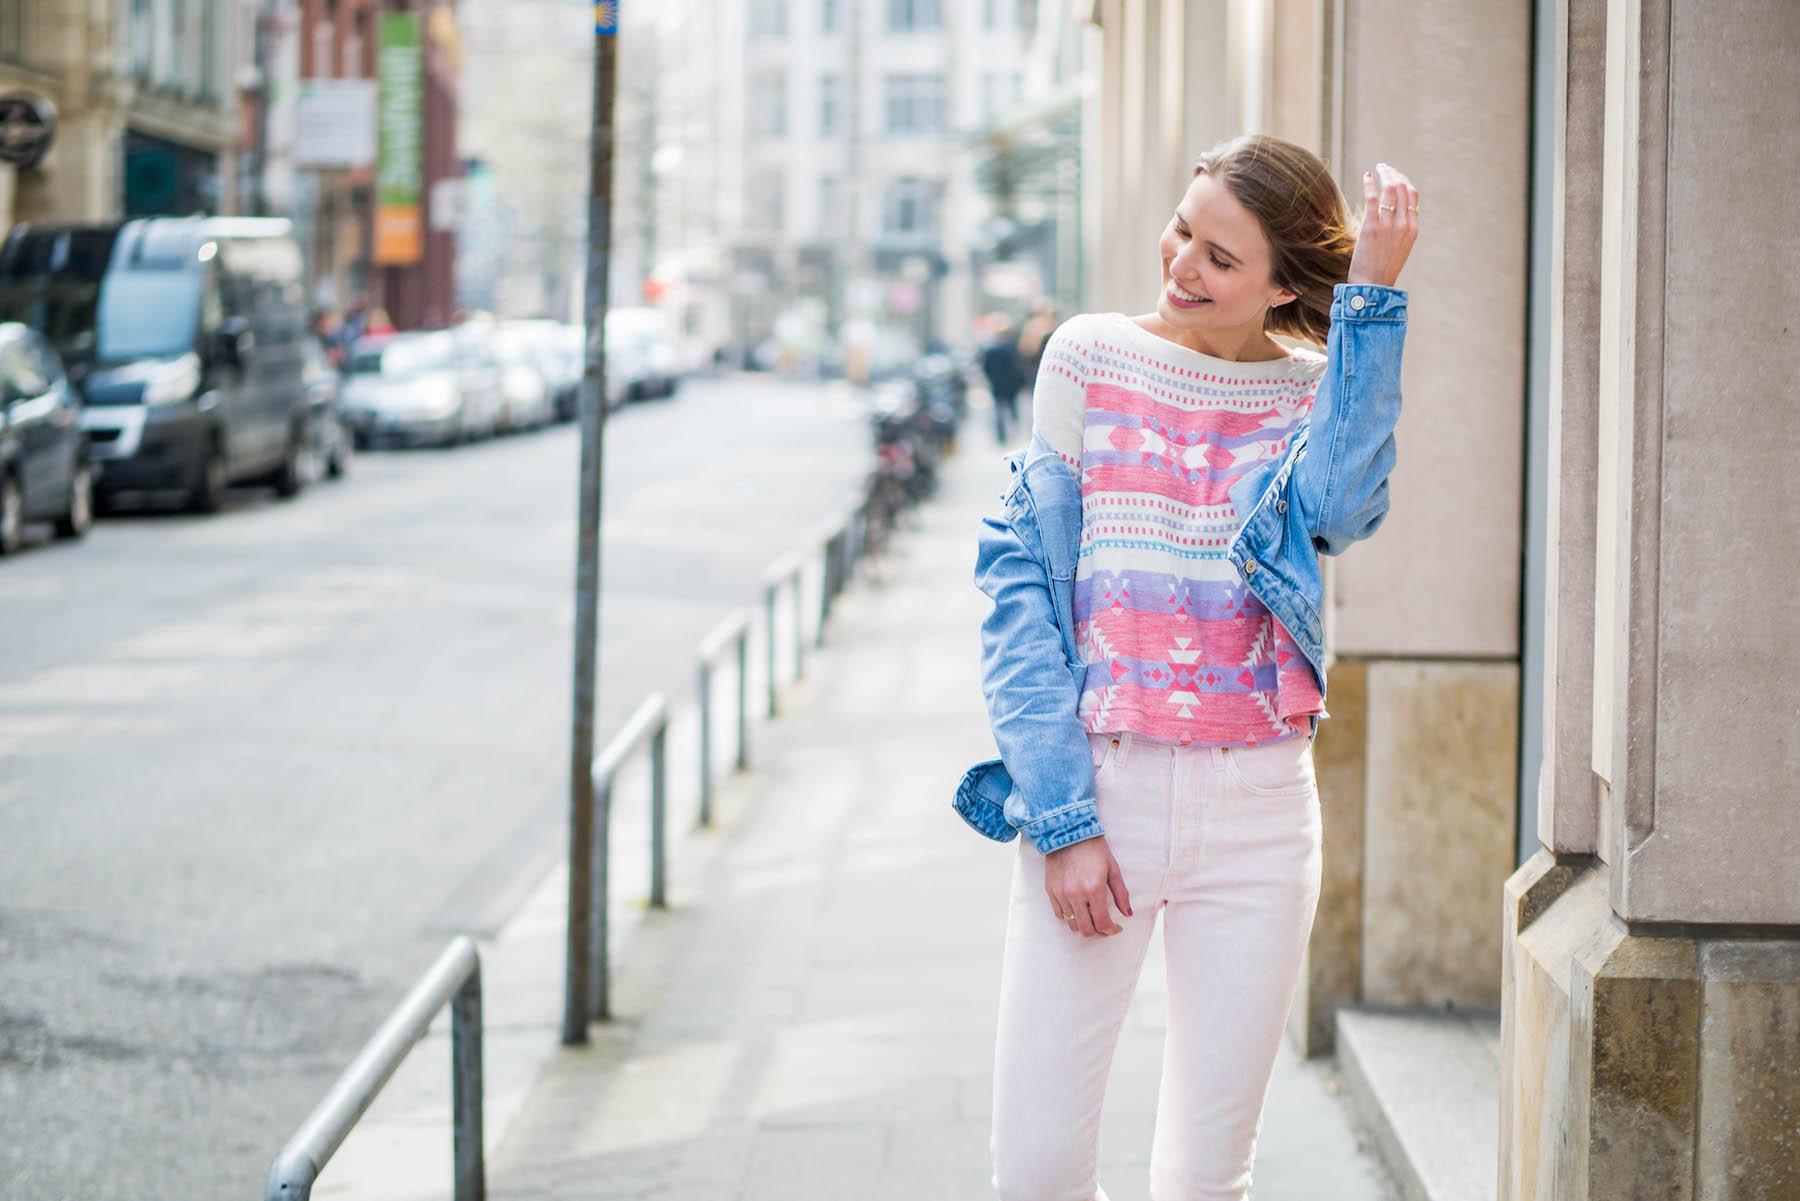 suelovesnyc_weekly_update_hamburg_levis_501_skinny_rosa_jeans_jeansjacke_rosa_jeans_positiven_dinge_positiv_denken